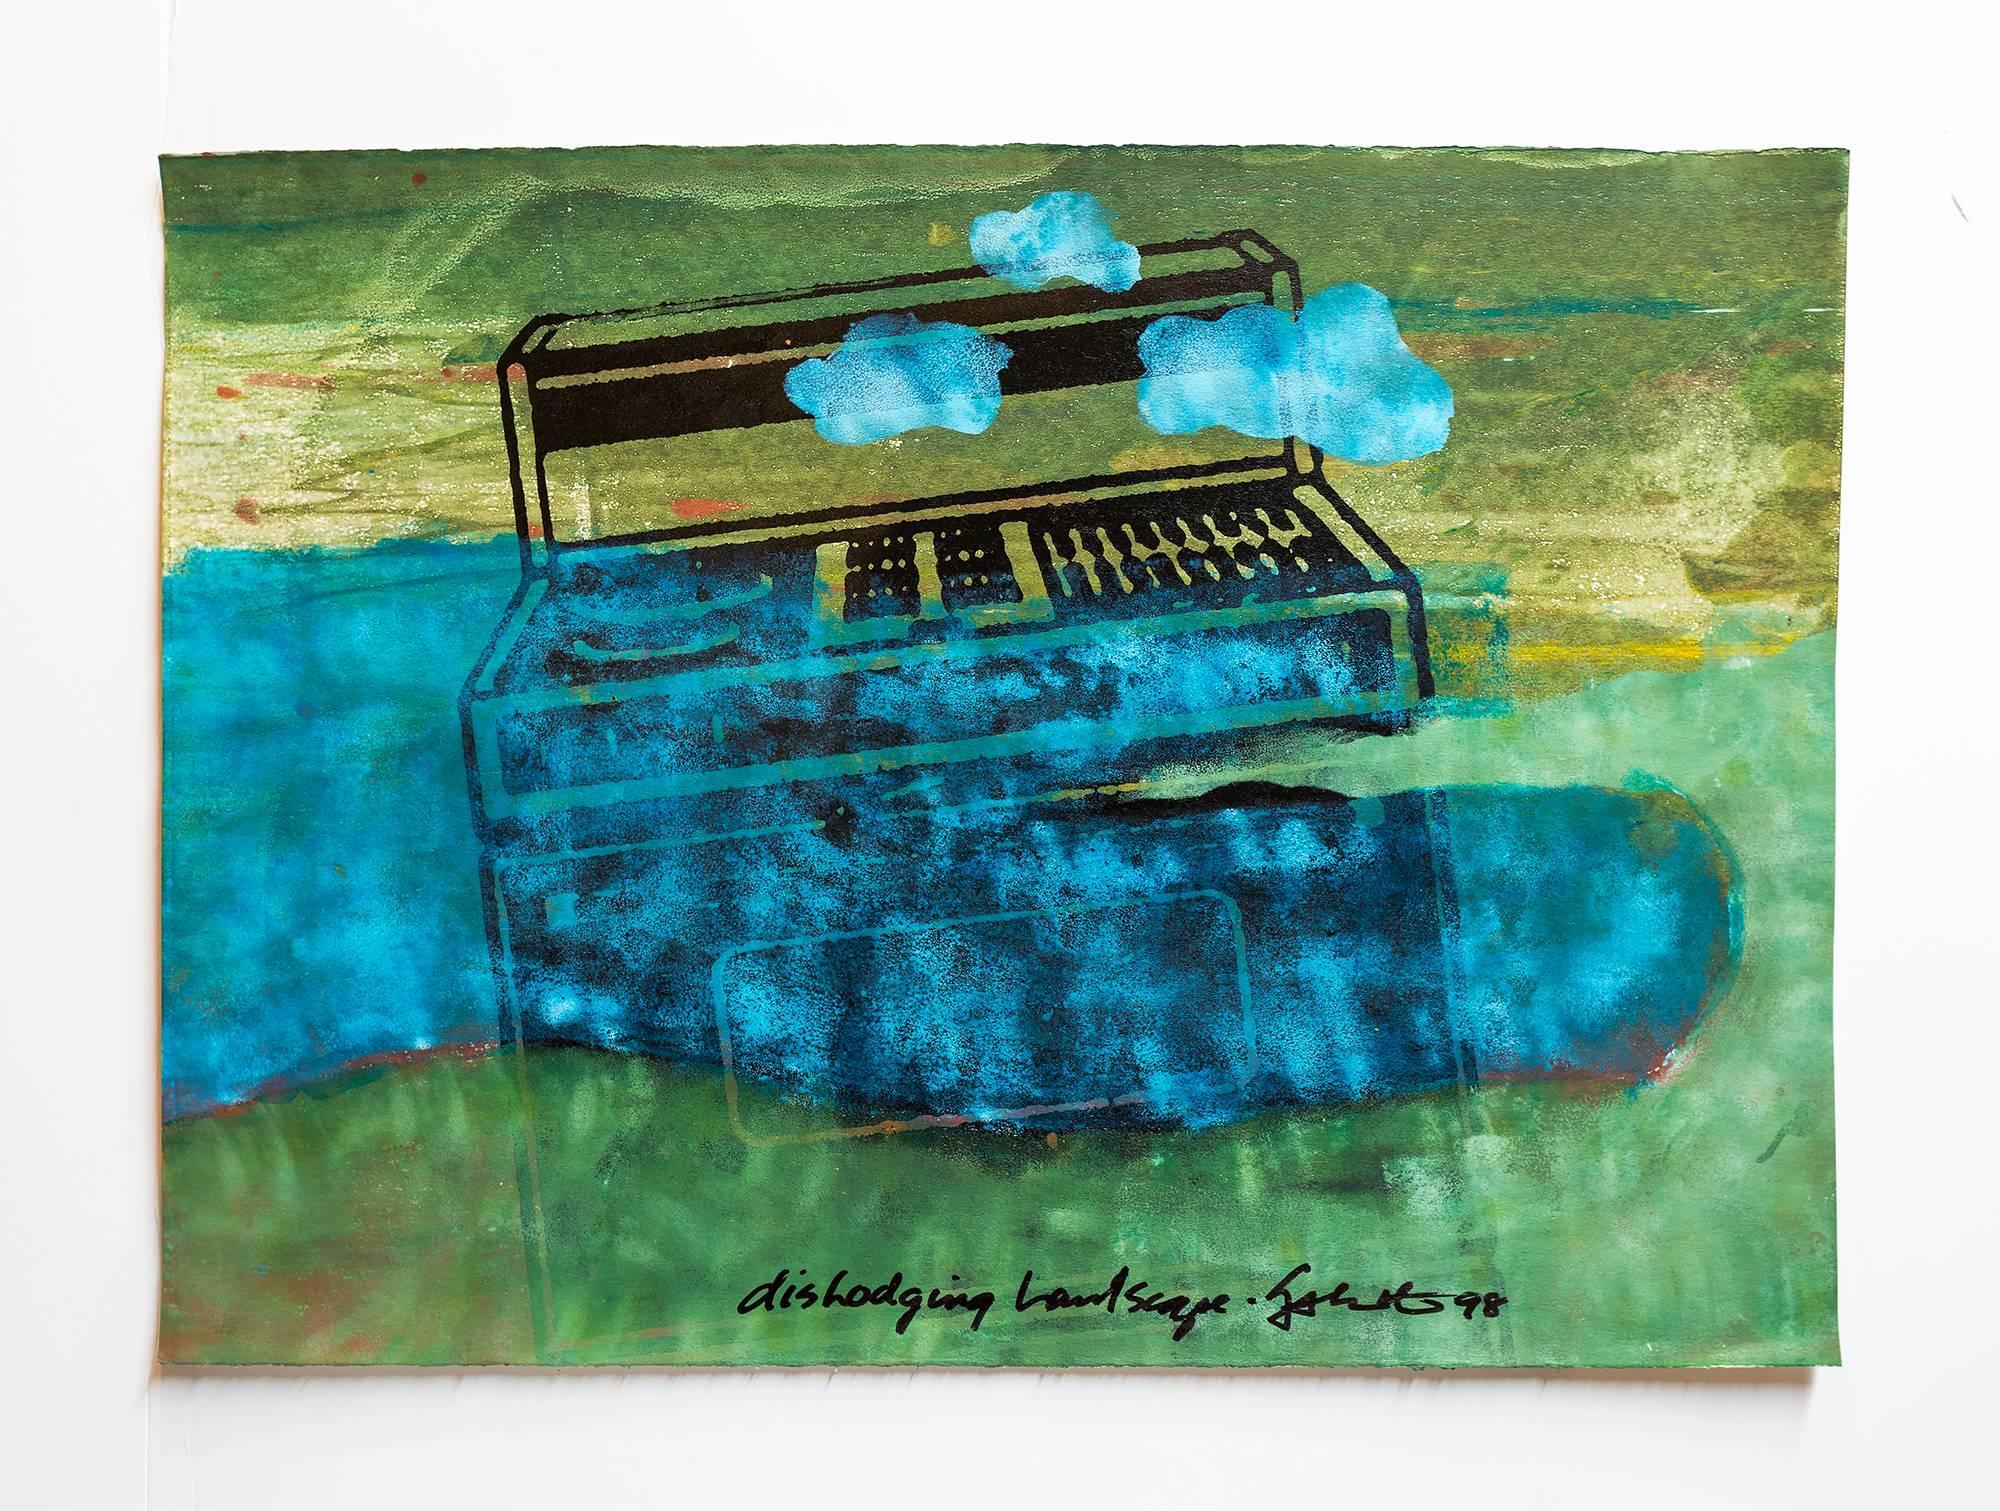 "Iain Baxter& ""Dislodging Landscape"" Conceptual Monoprint Painting"